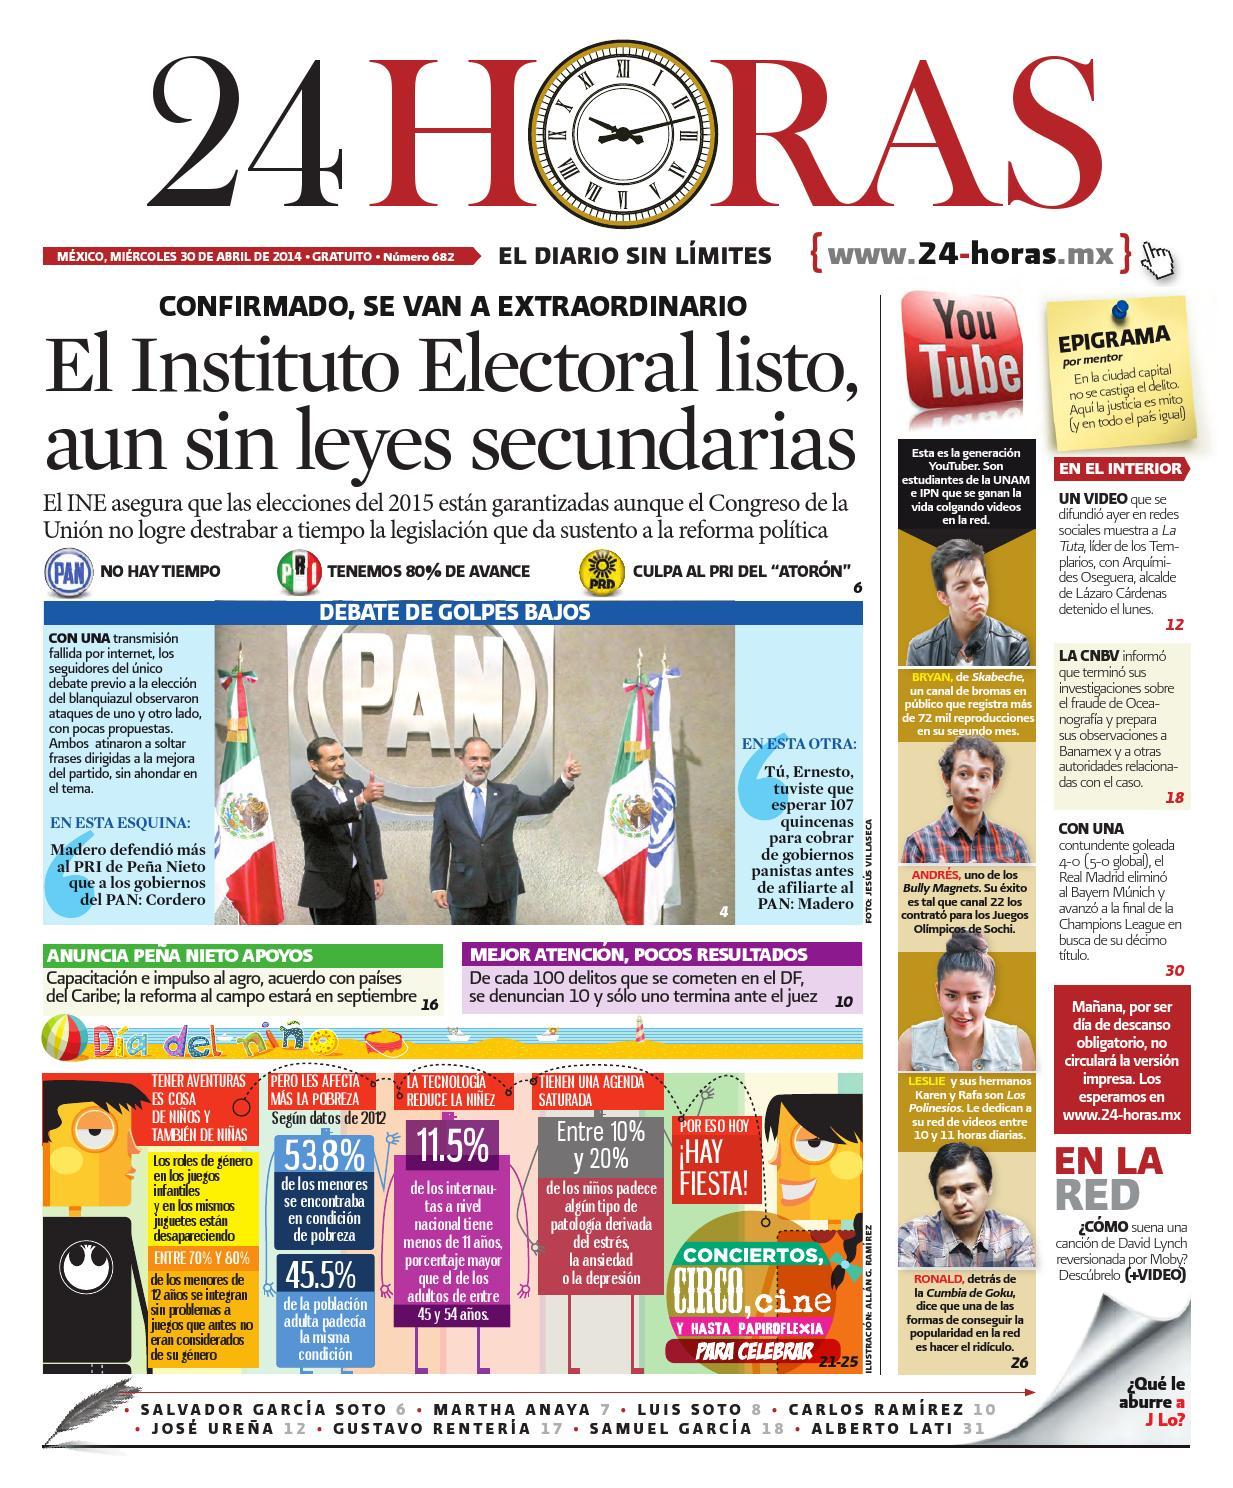 Abril | 30 | 2014 by Información Integral 24/7 SAPI de C.V. - issuu